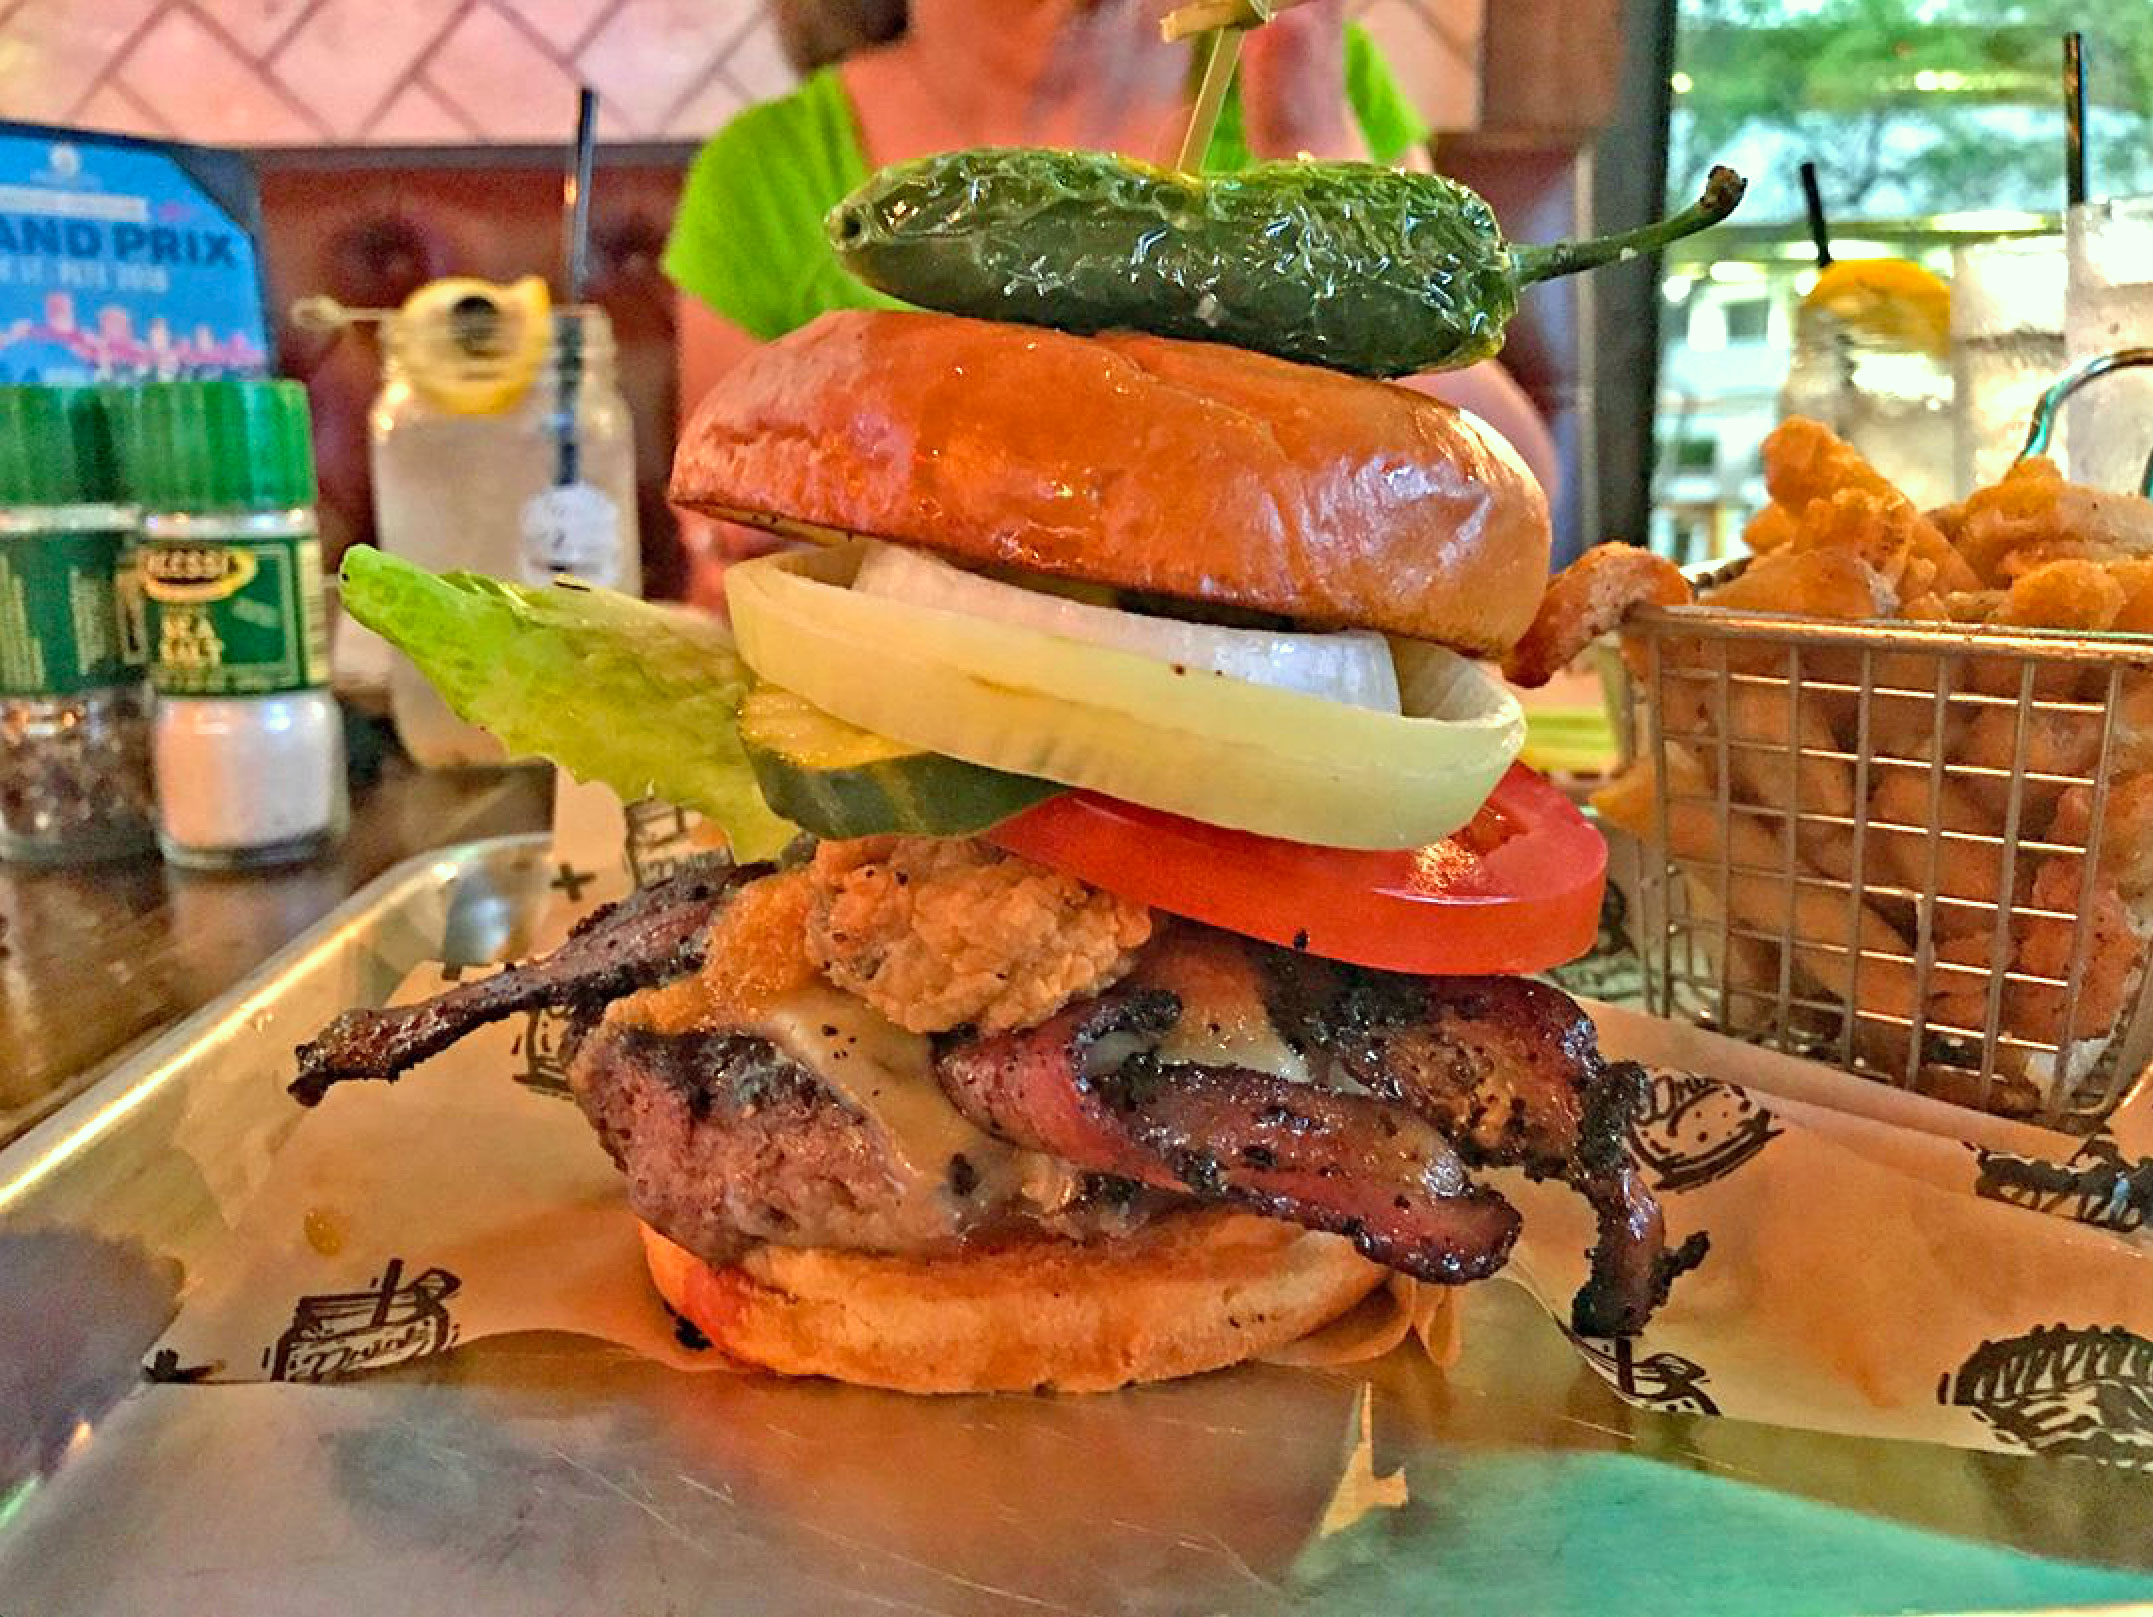 Fire Cracker Burger at The Avenue